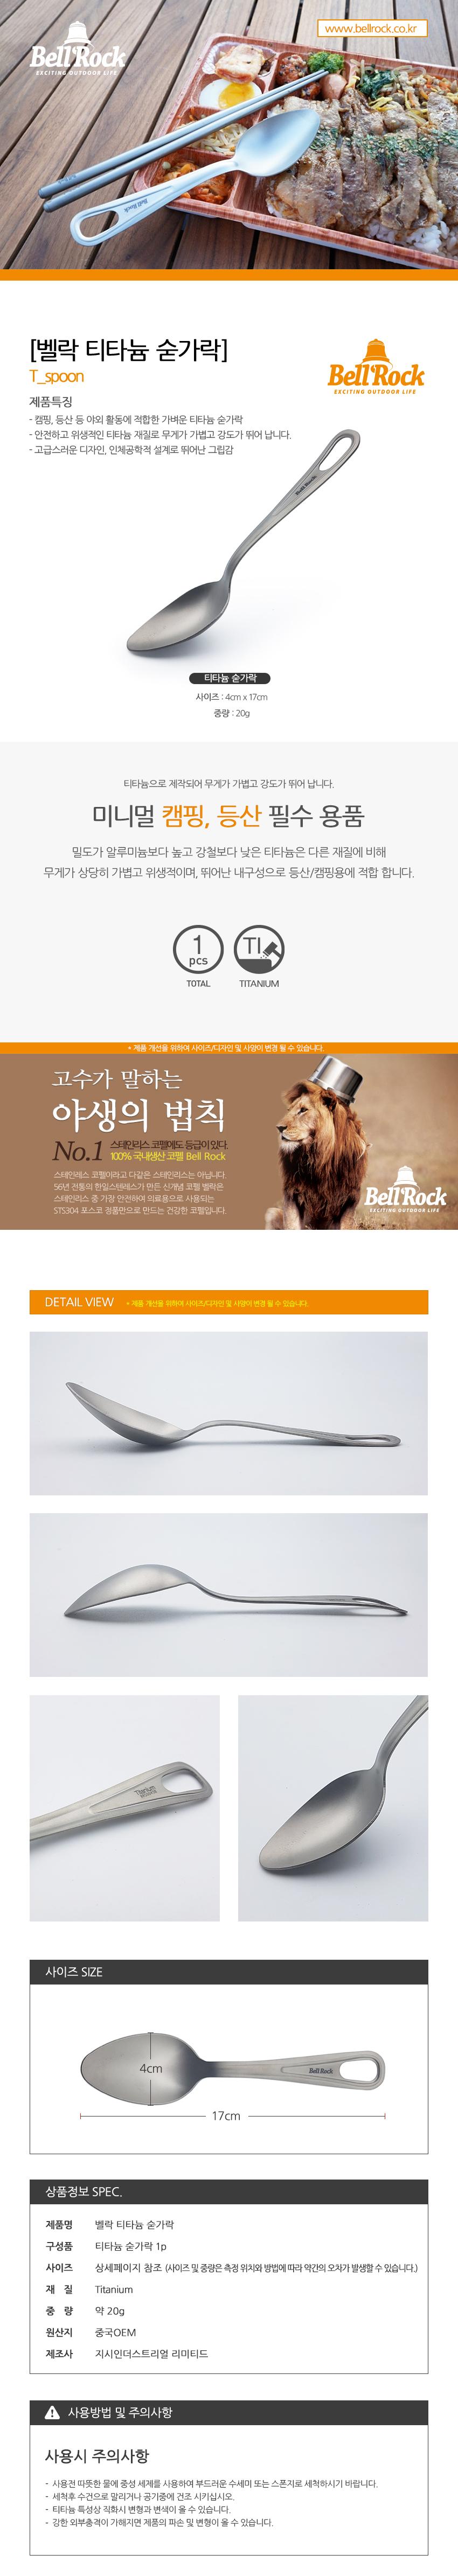 T_spoon_850.jpg